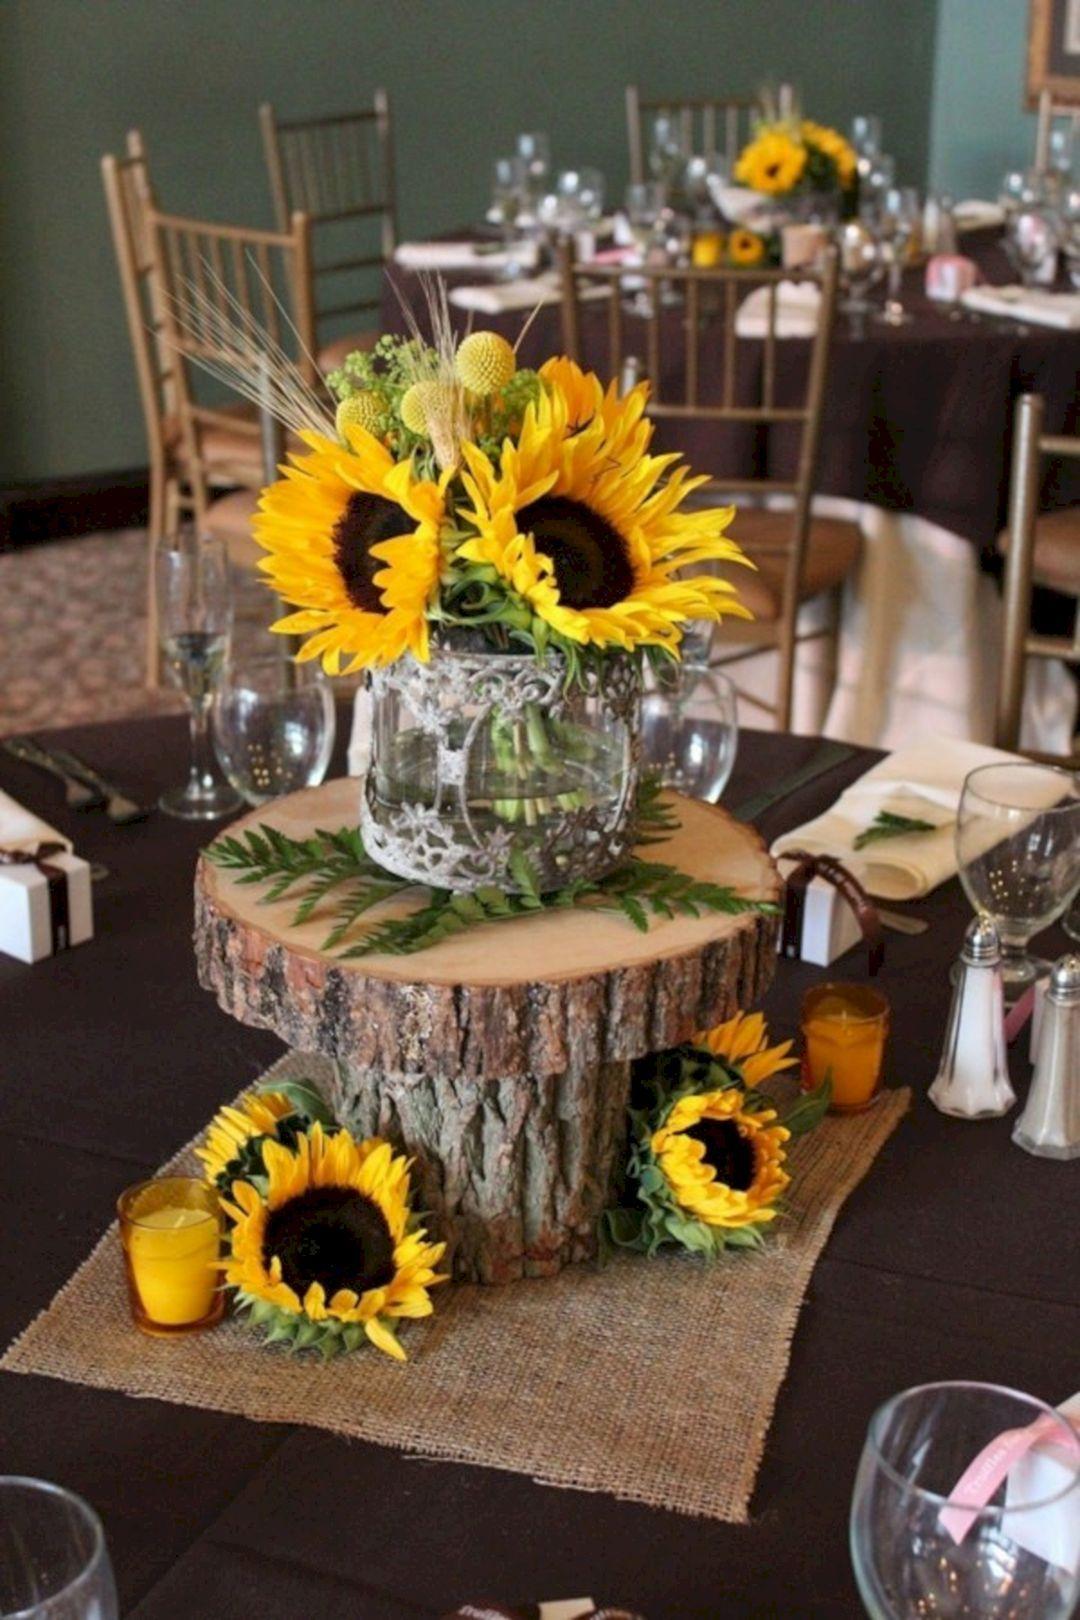 15+ Extraordinary Sunflower Wedding Ideas That Inspired